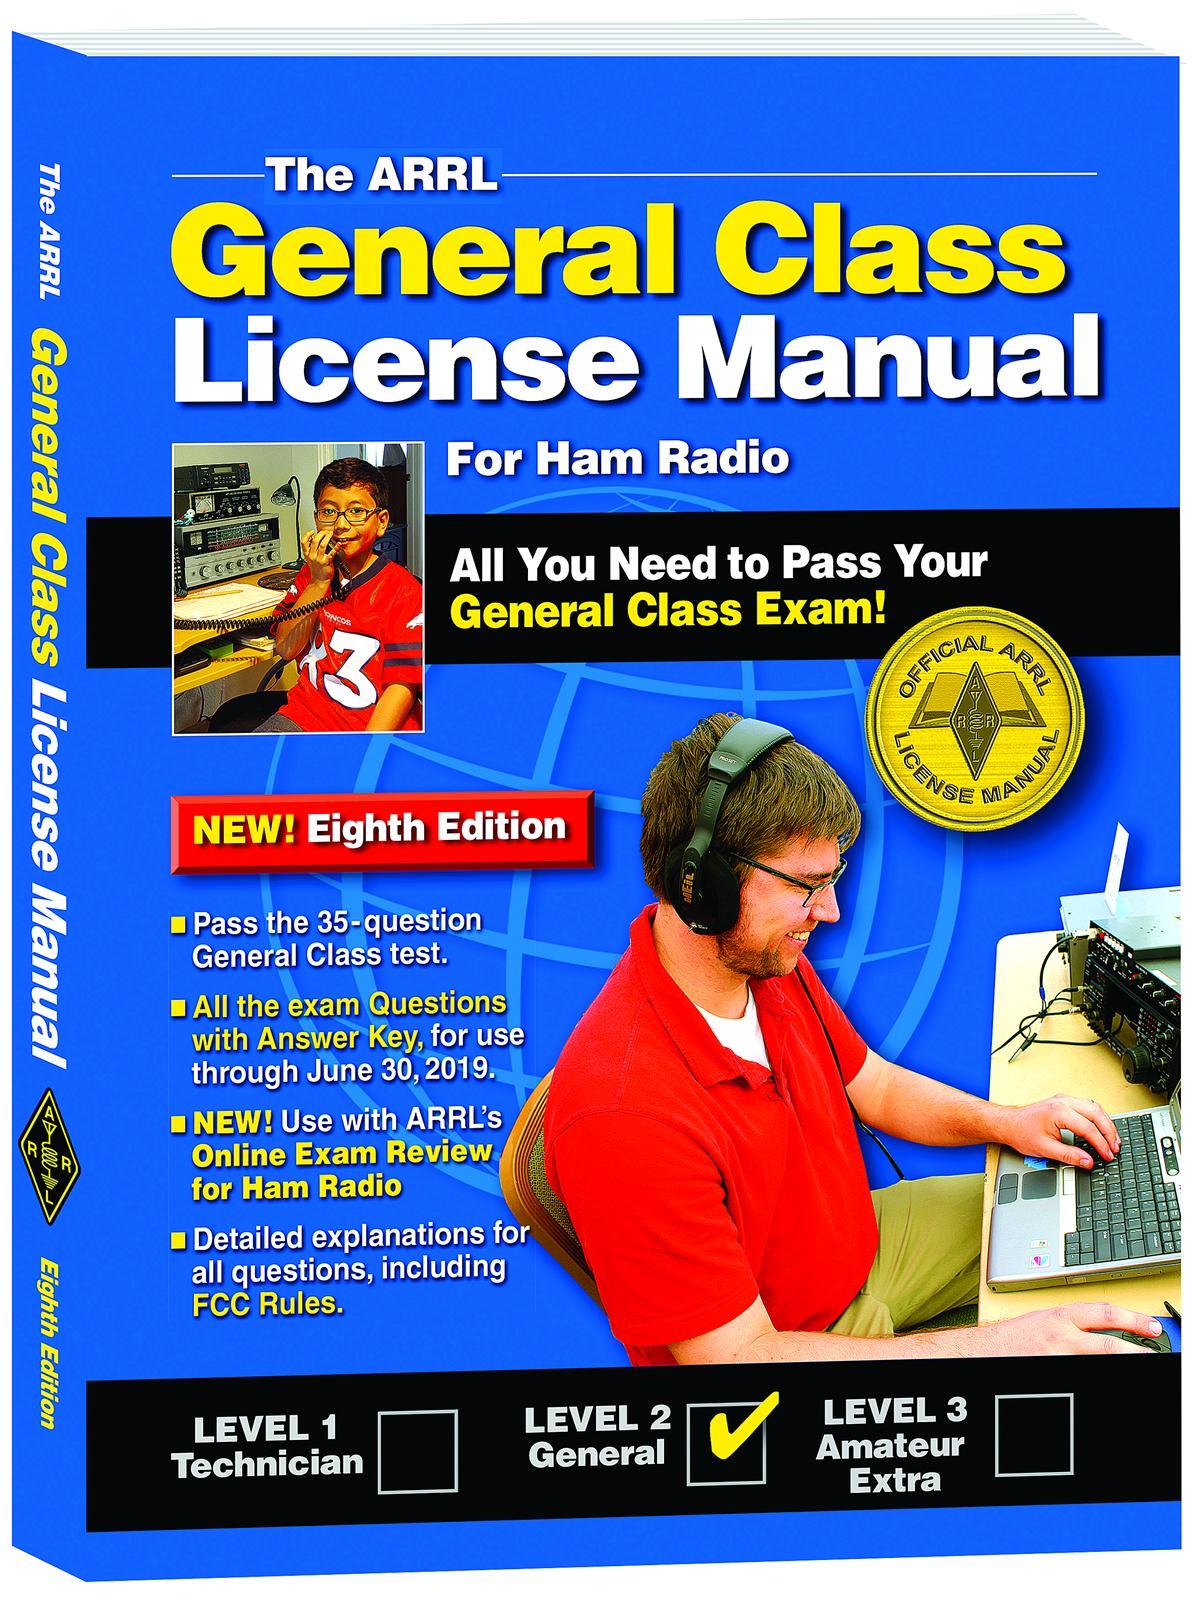 arrl s general class license manual 8th edition 0307 free shipping rh dxengineering com arrl license manual 3rd edition arrl technician license manual pdf